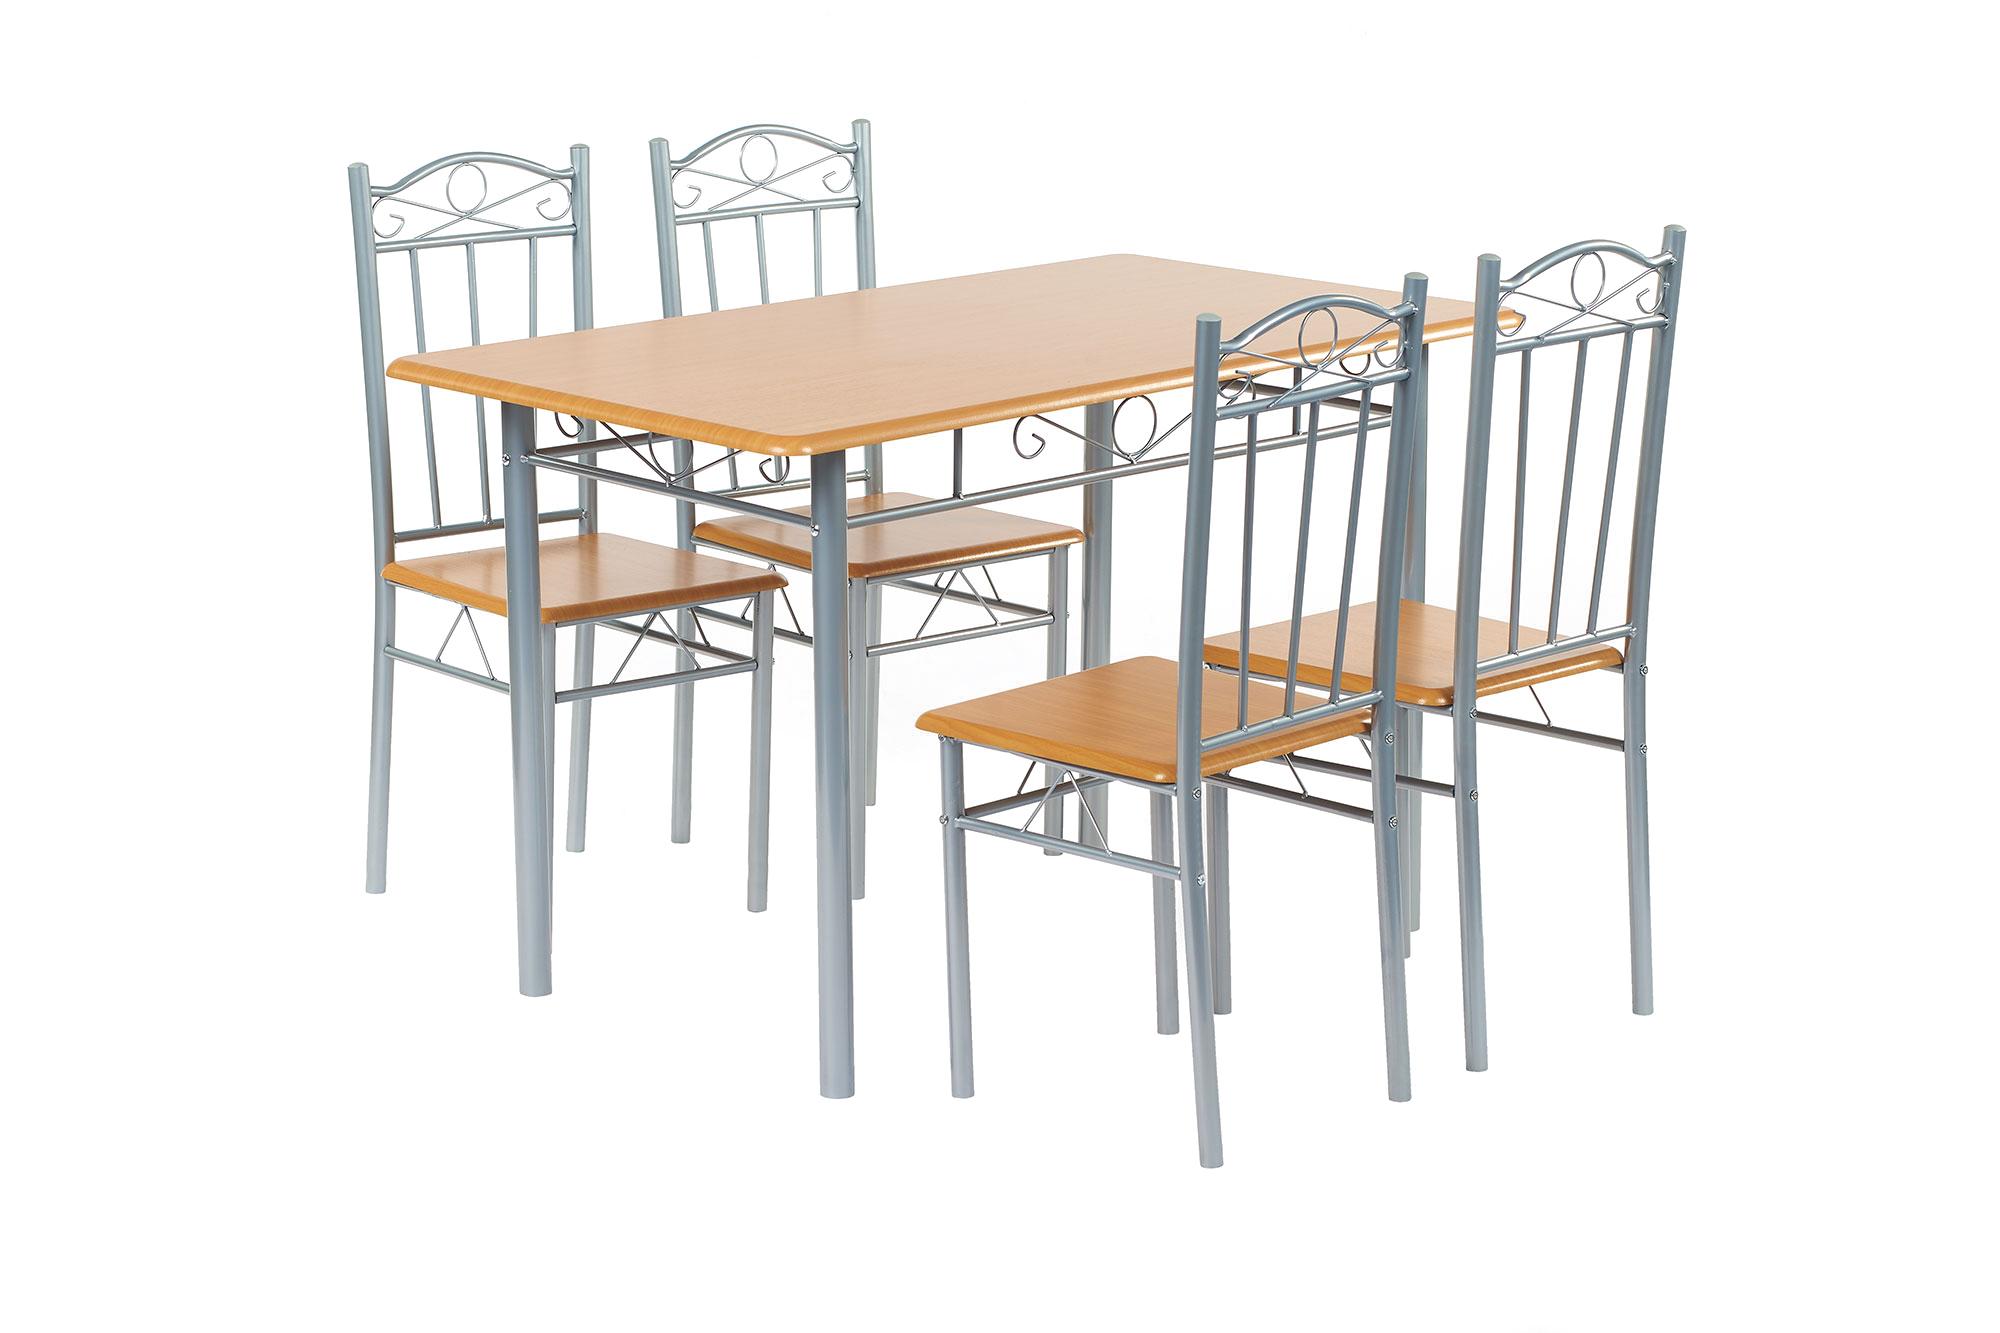 tischset esstischset esszimmer tisch 4 st hle hellem holz k che ebay. Black Bedroom Furniture Sets. Home Design Ideas